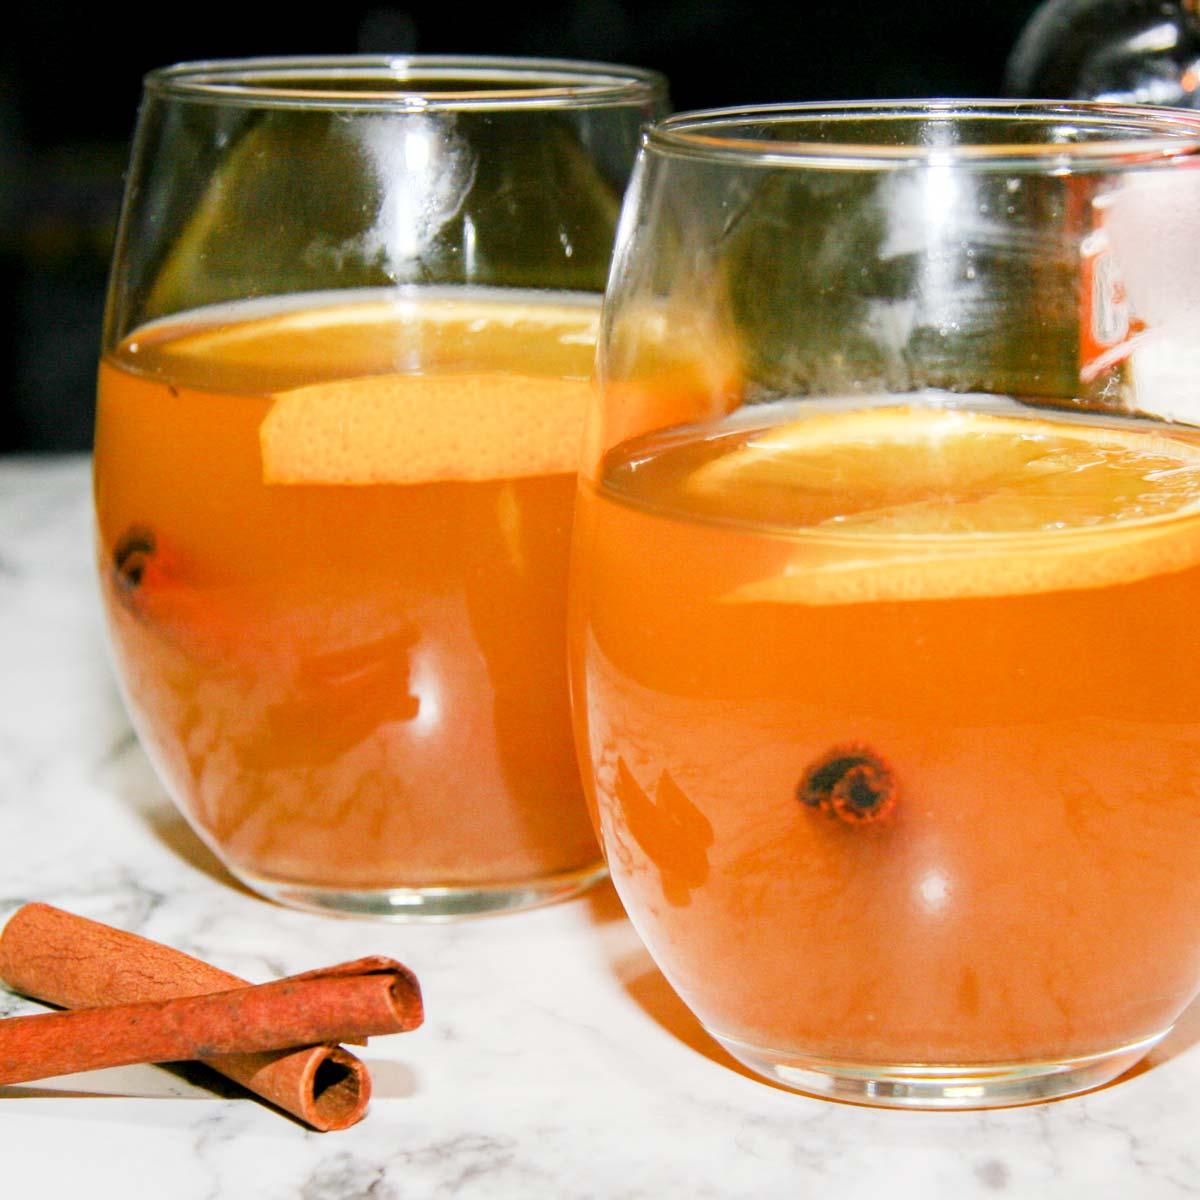 Warming Winter White (Spiced Wine with Orange)